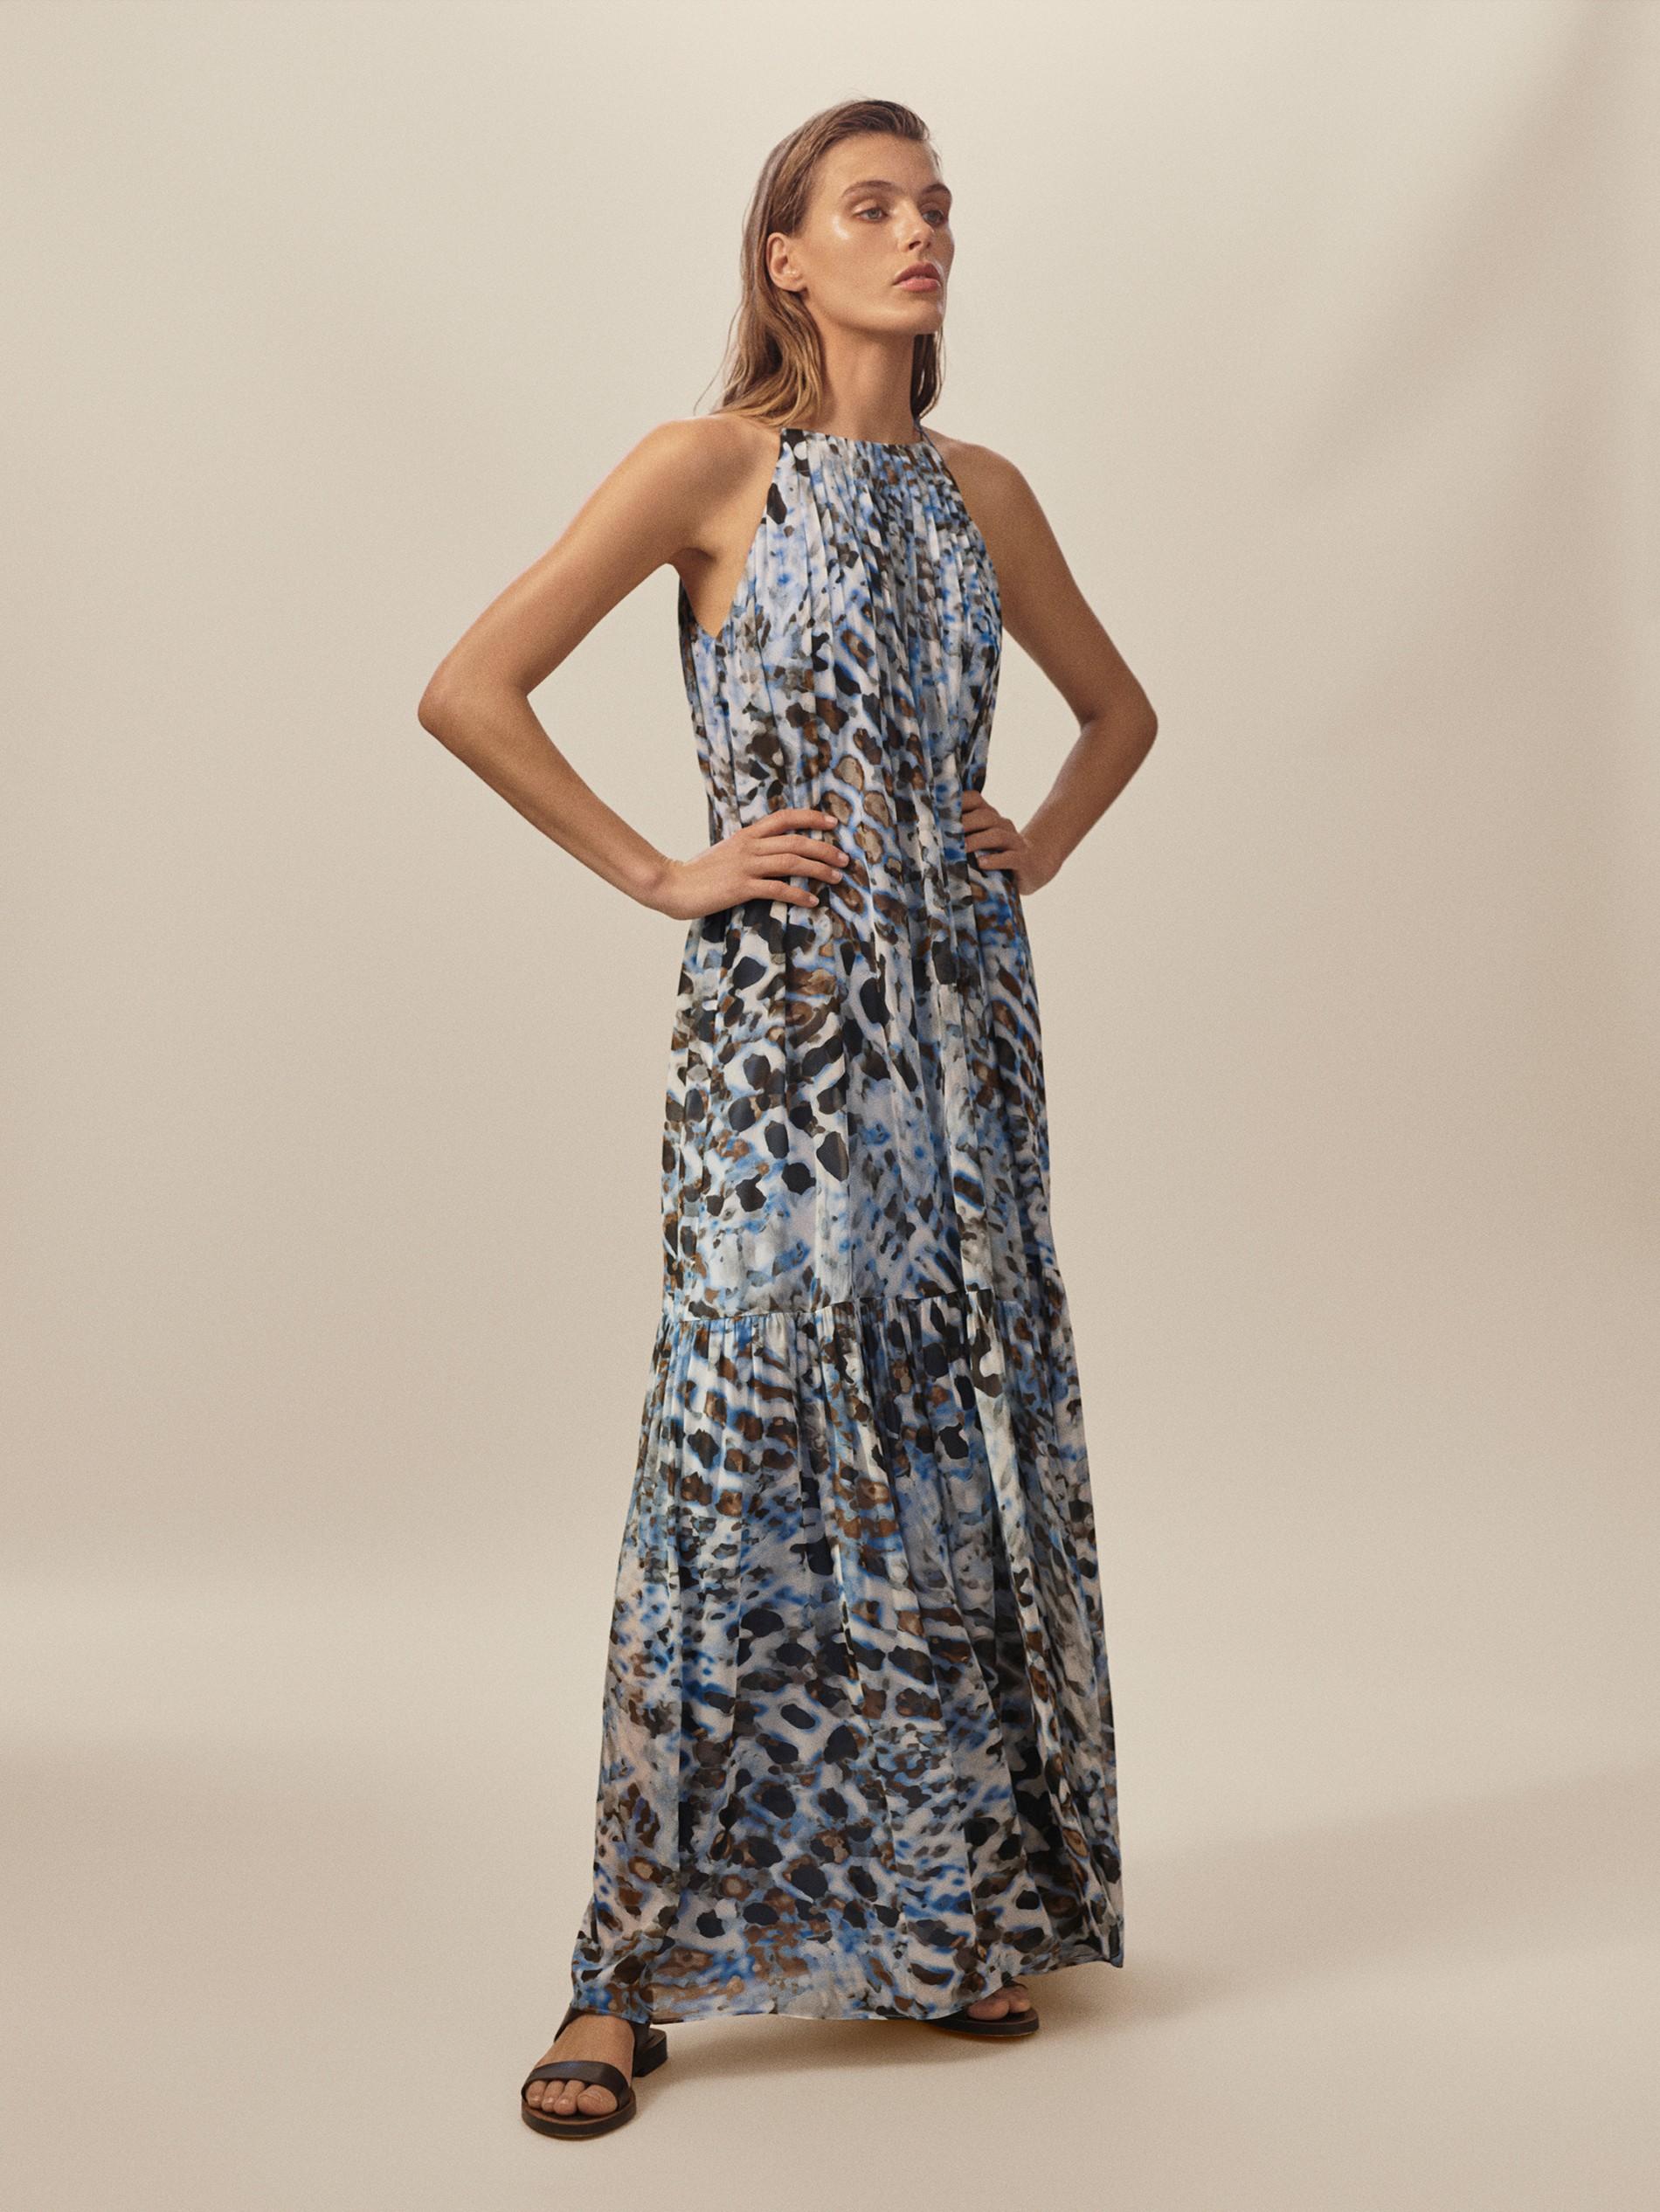 7008fb4e8237 Τα καλύτερα φορέματα για τους γάμους του καλοκαιριού - Για όλα τα ...